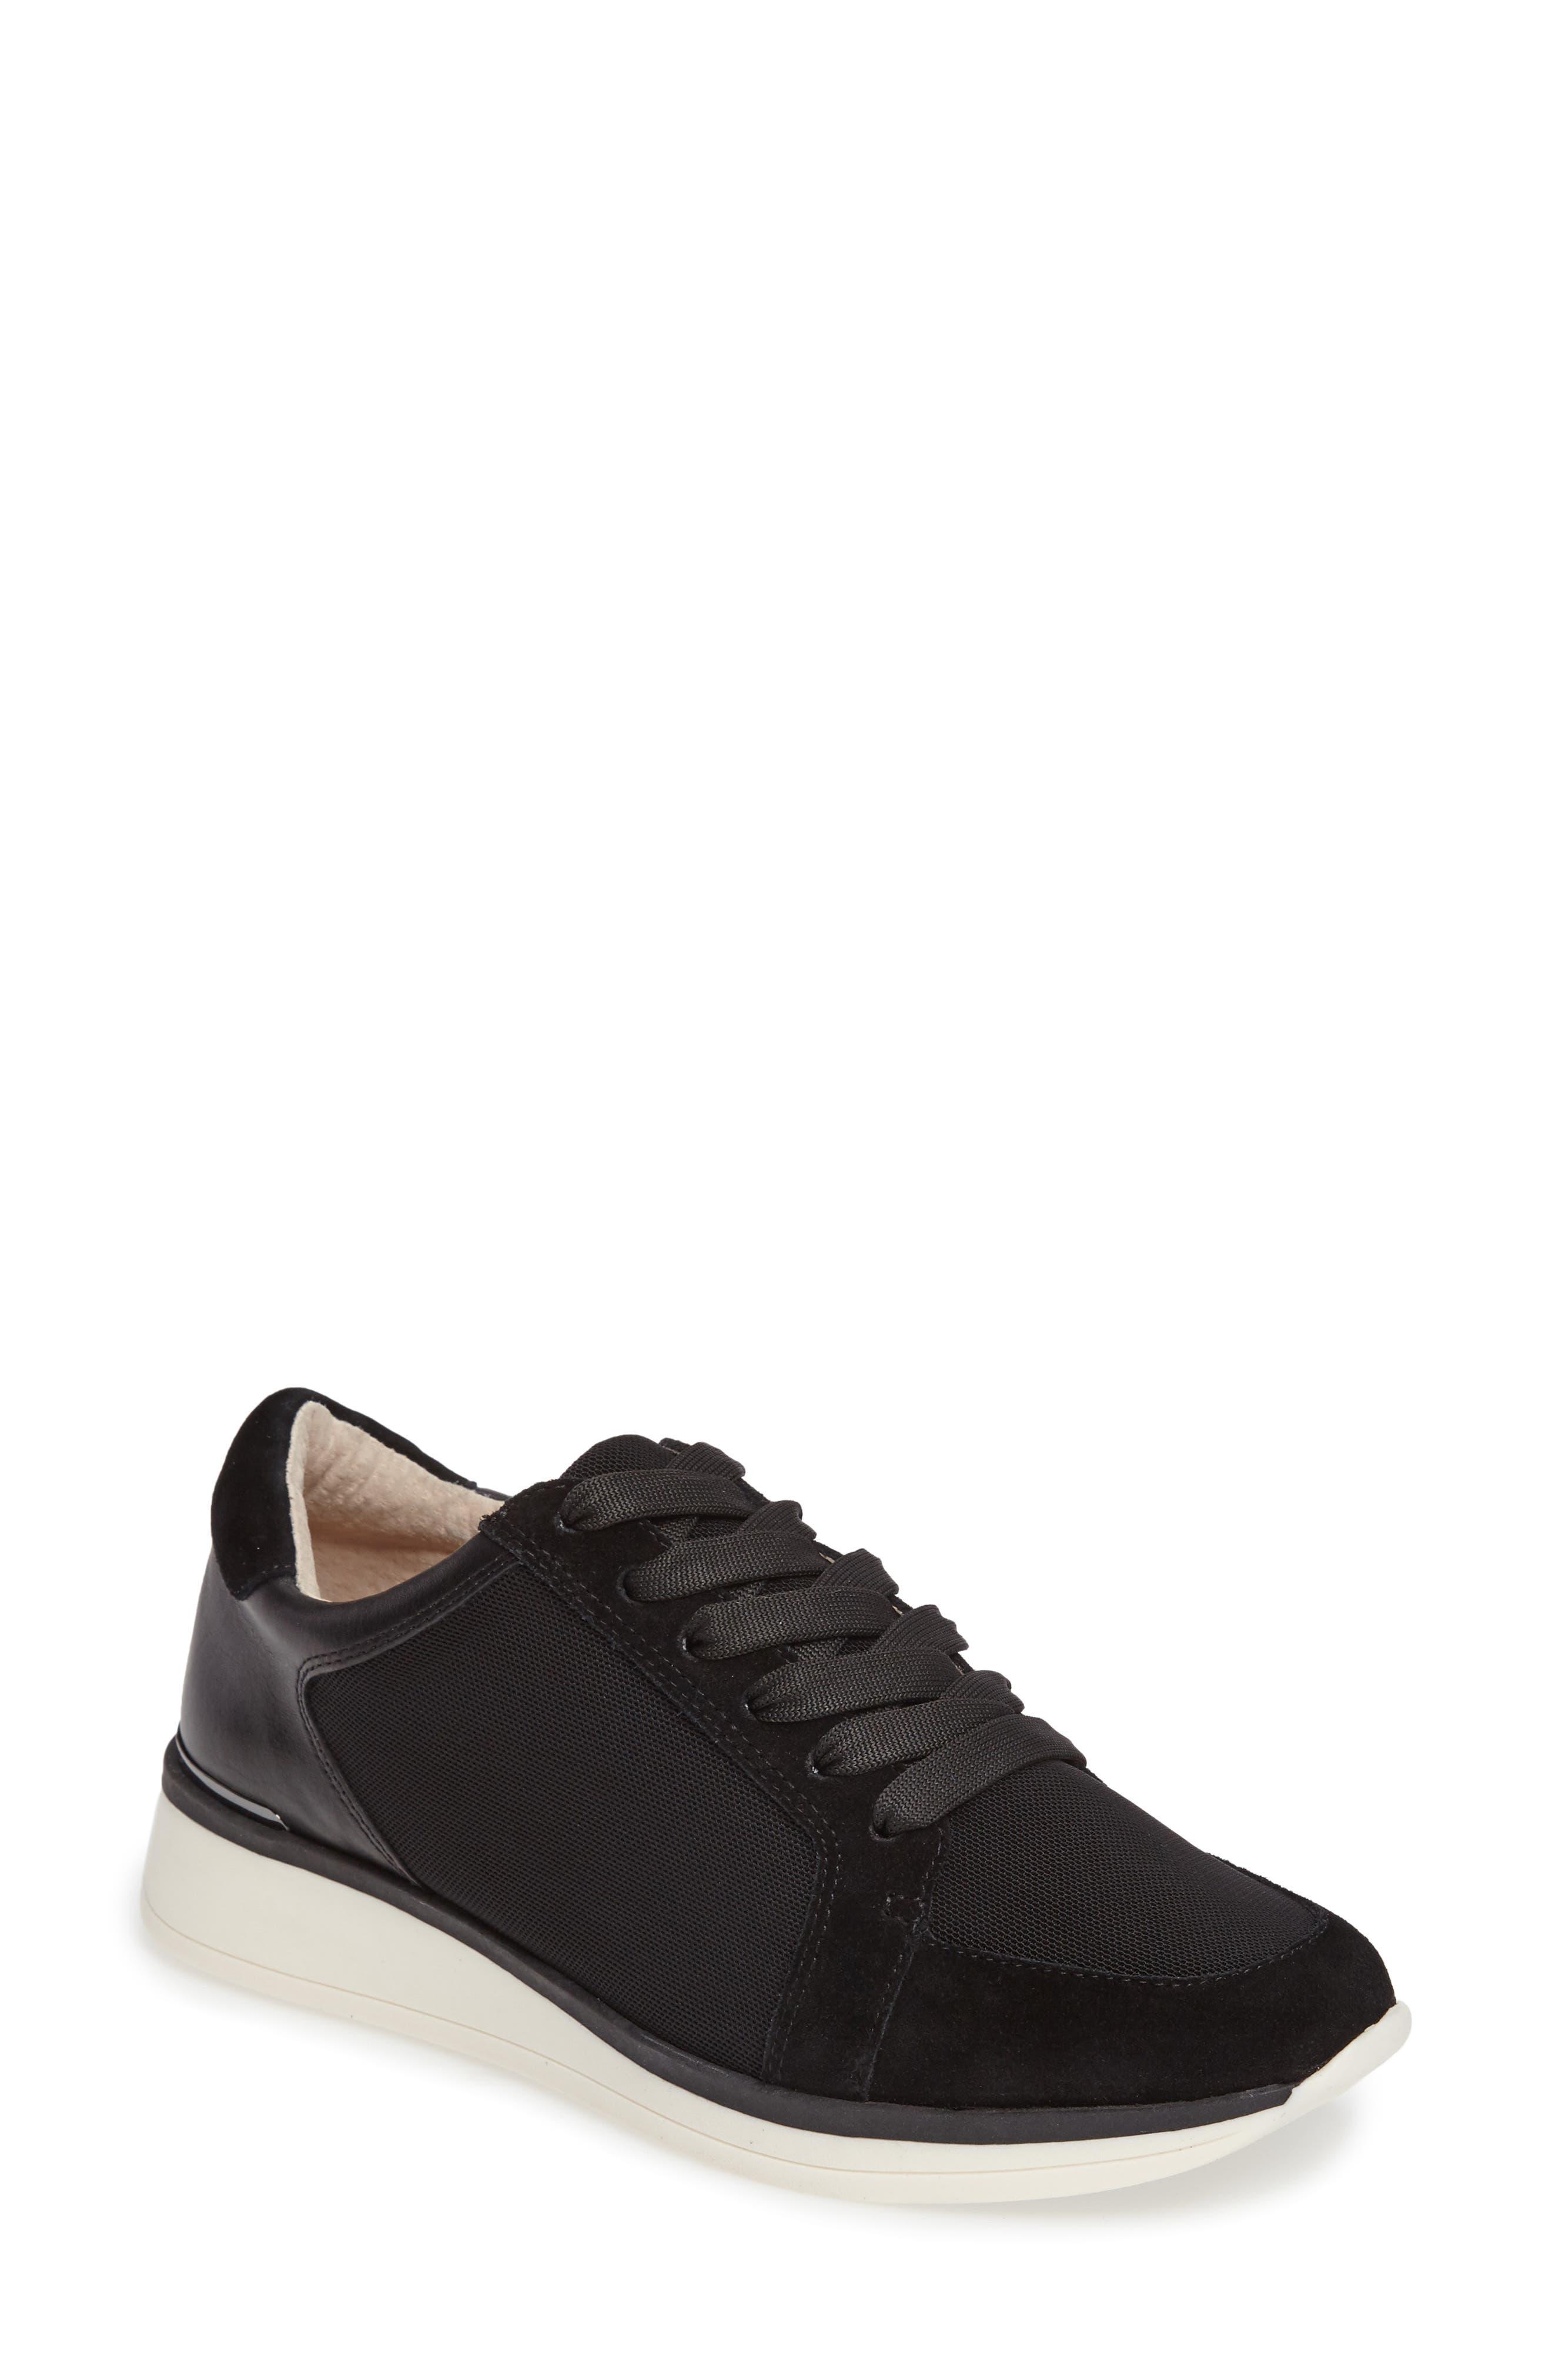 Berlena Sneaker,                             Main thumbnail 1, color,                             003